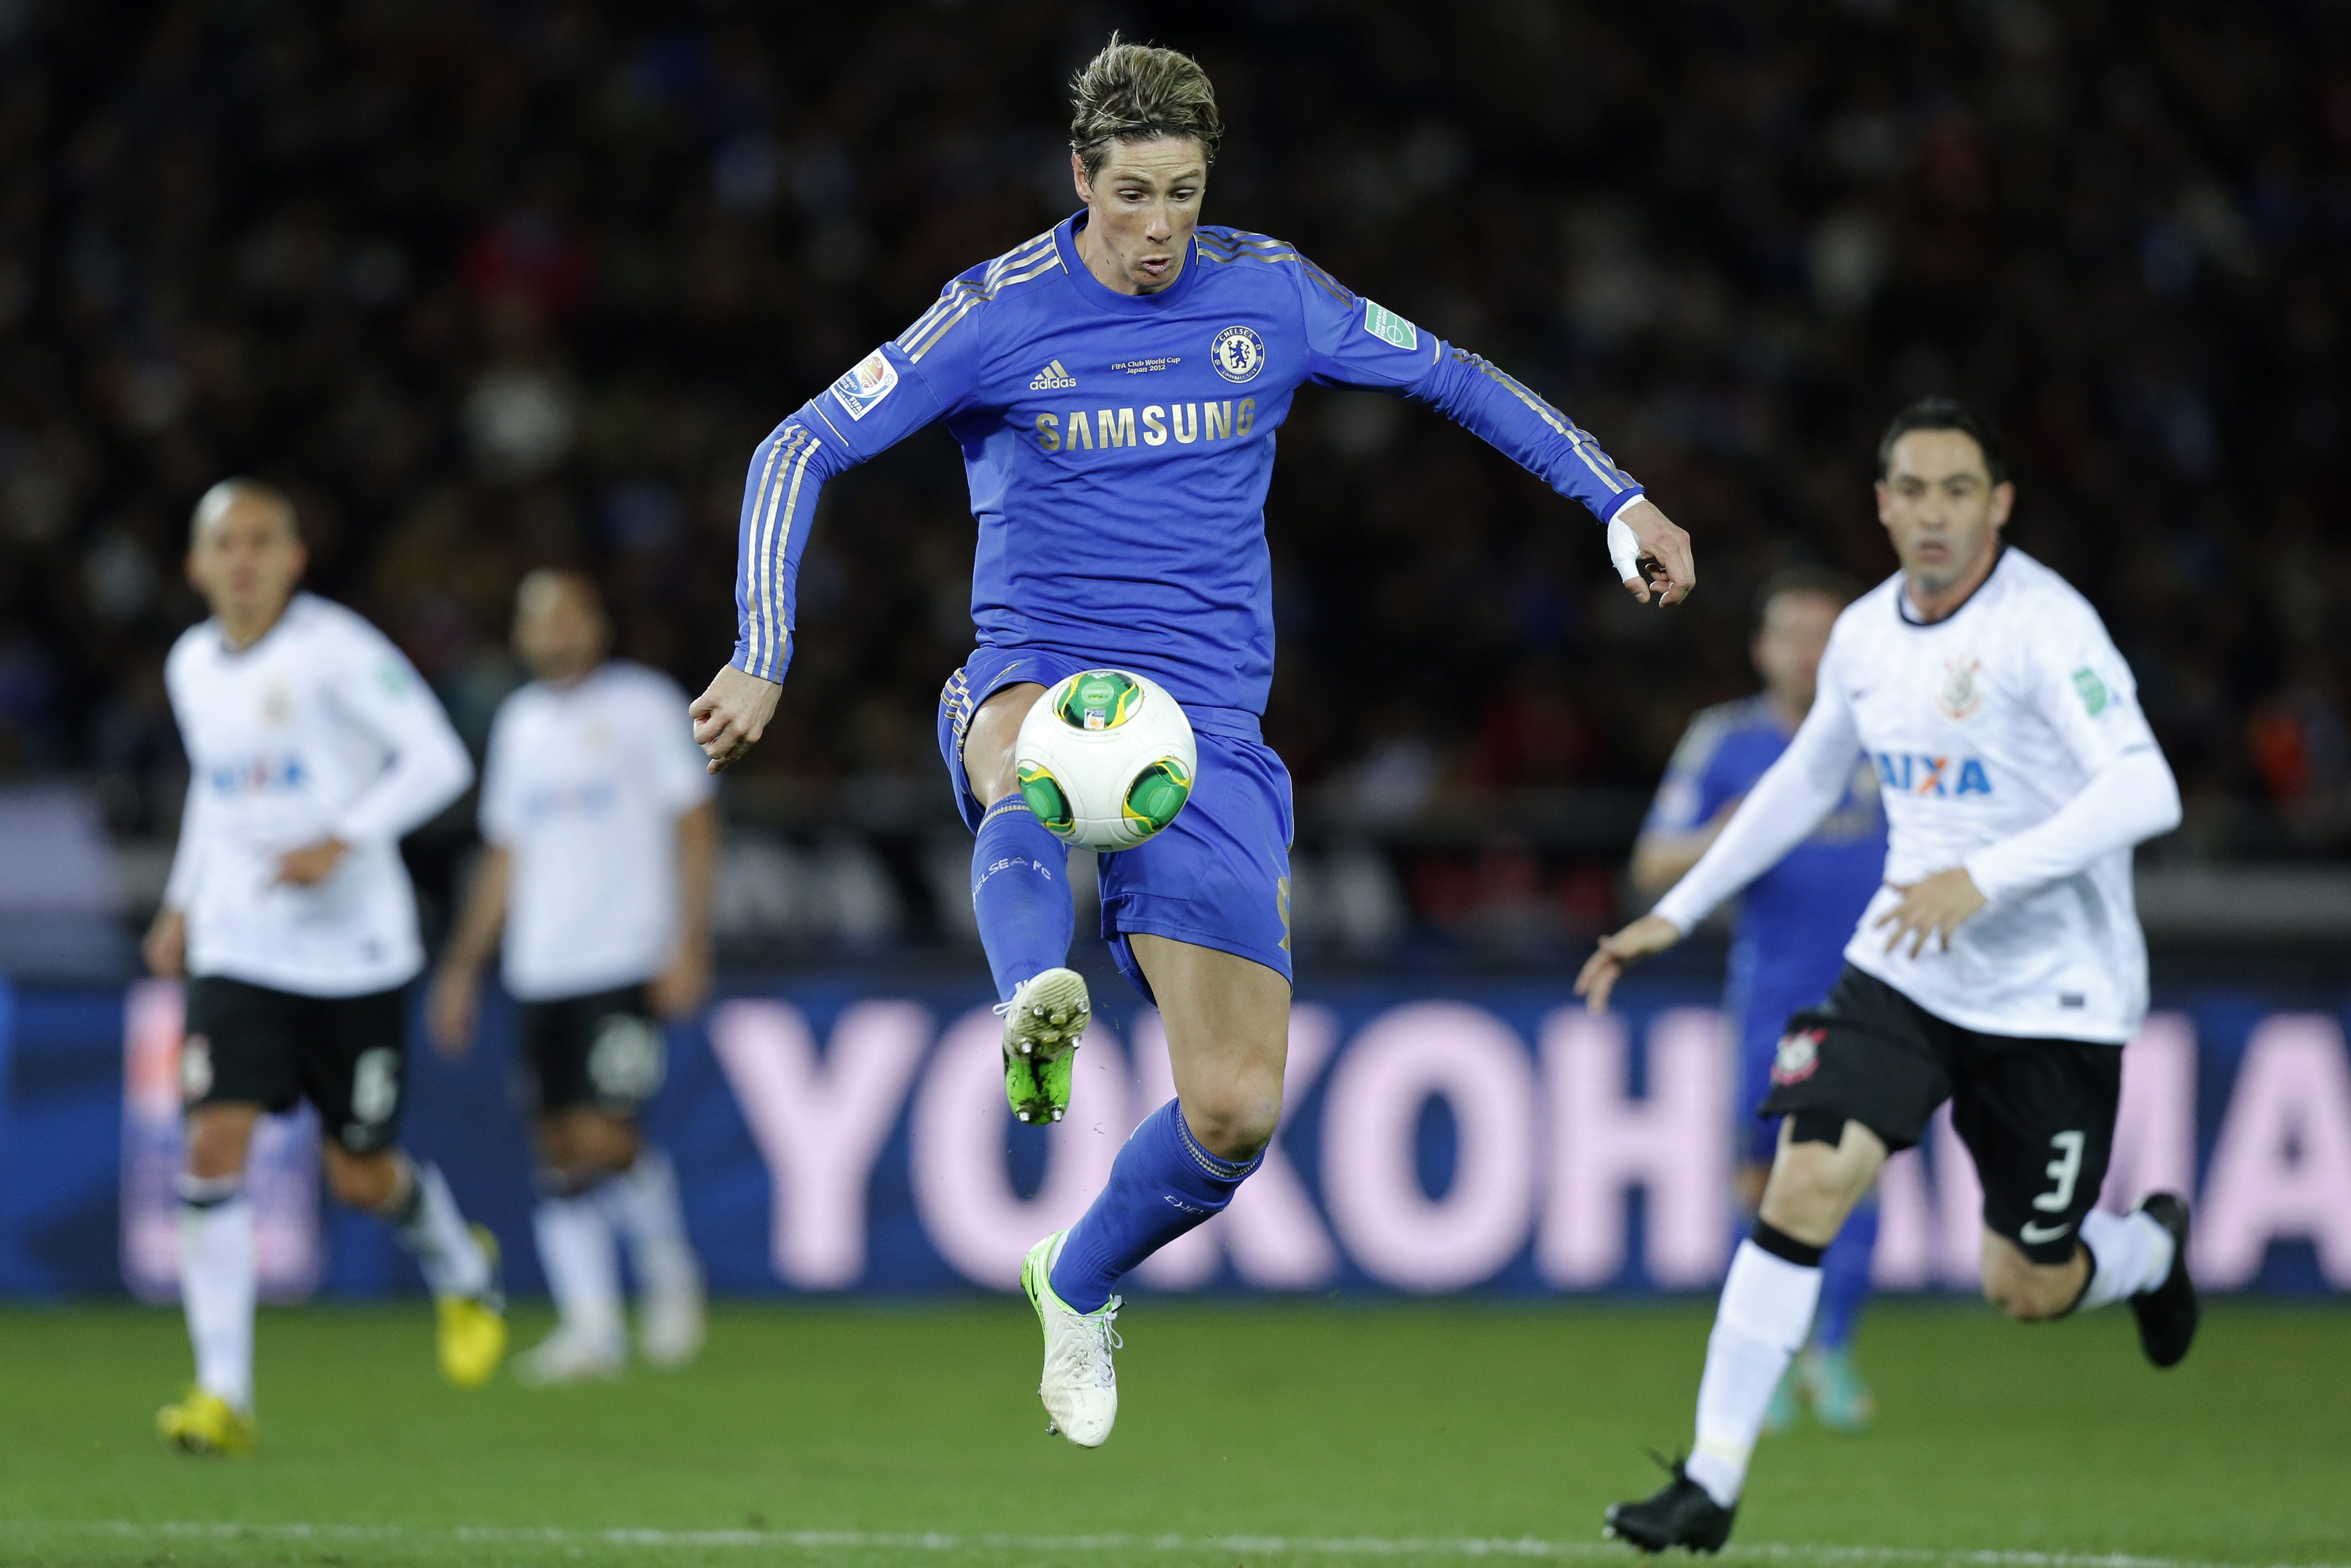 Corinthians v Chelsea – FIFA Club World Cup Final 2012